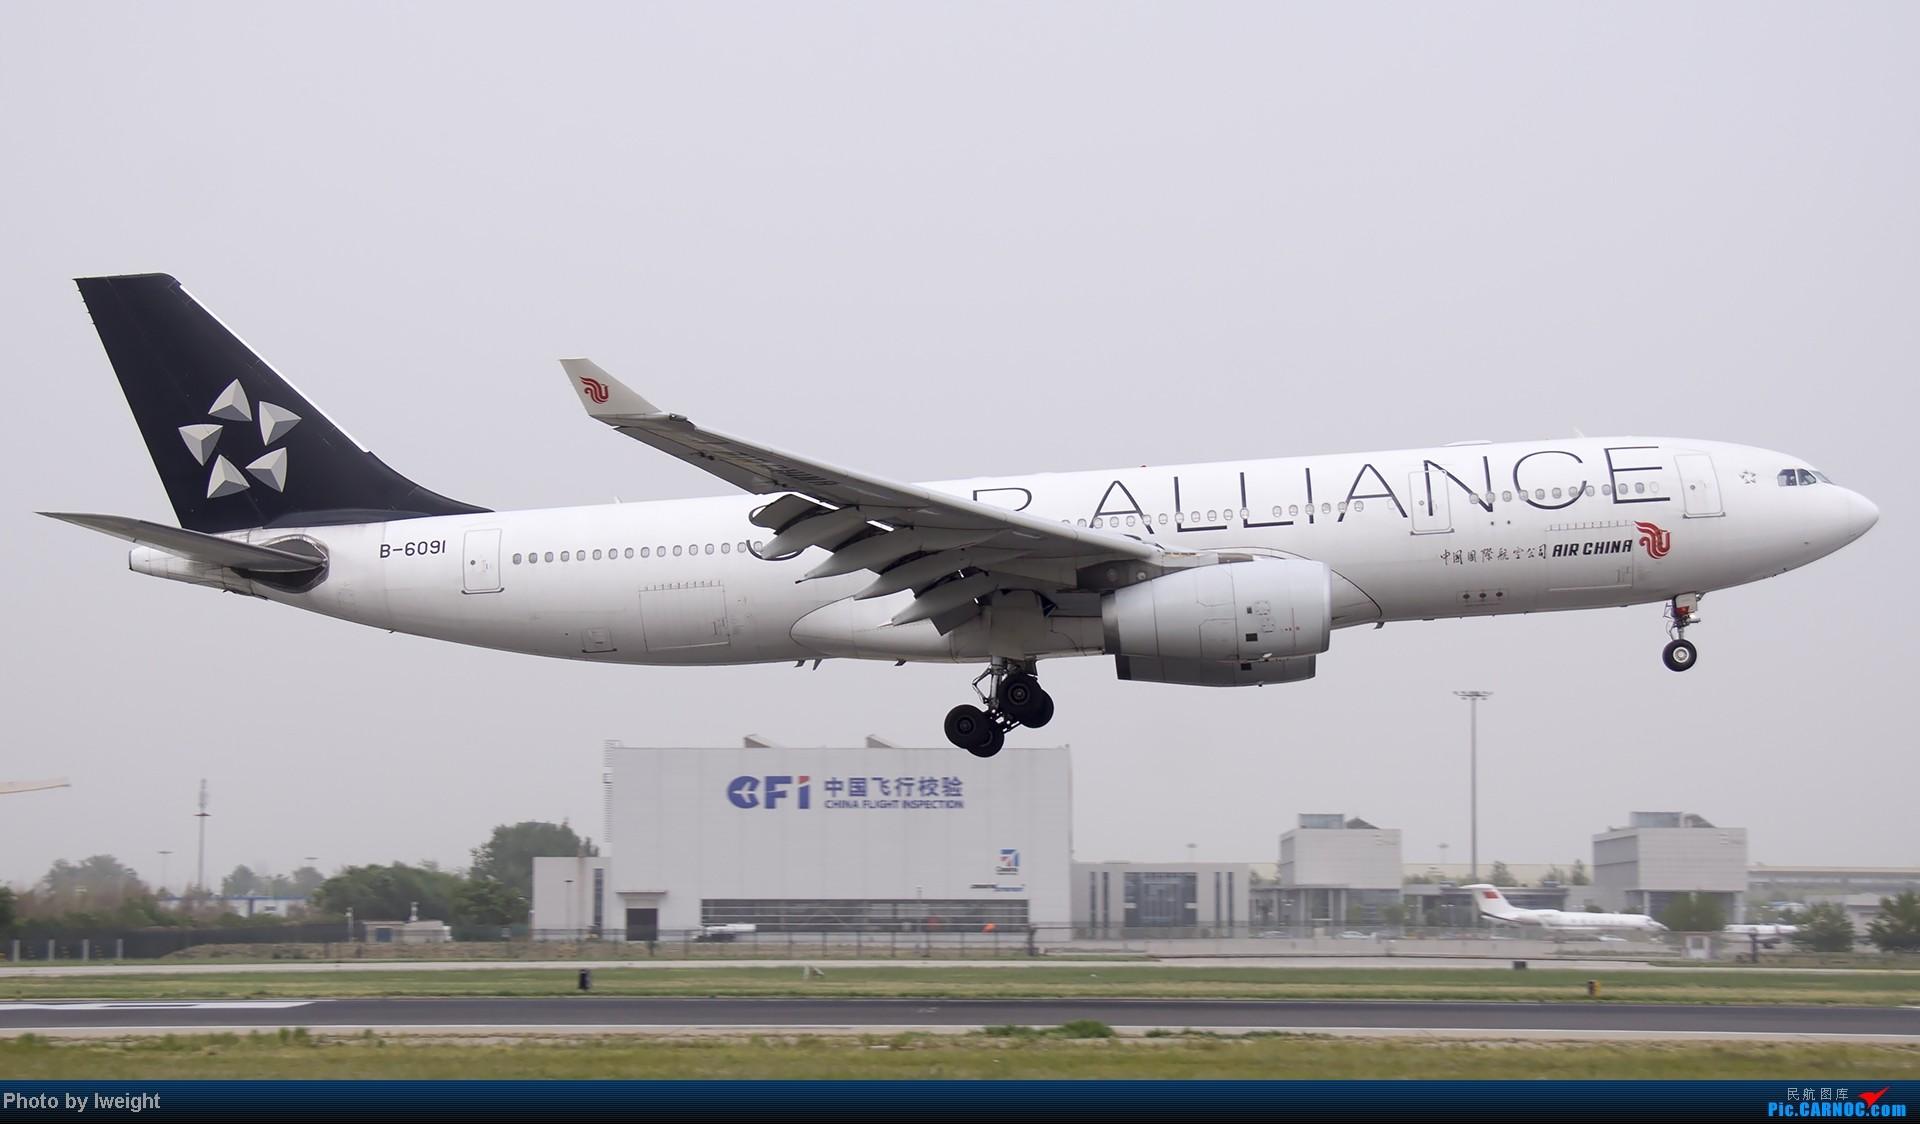 Re:[原创]霾天首都机场随拍 AIRBUS A330-200 B-6091 中国北京首都机场